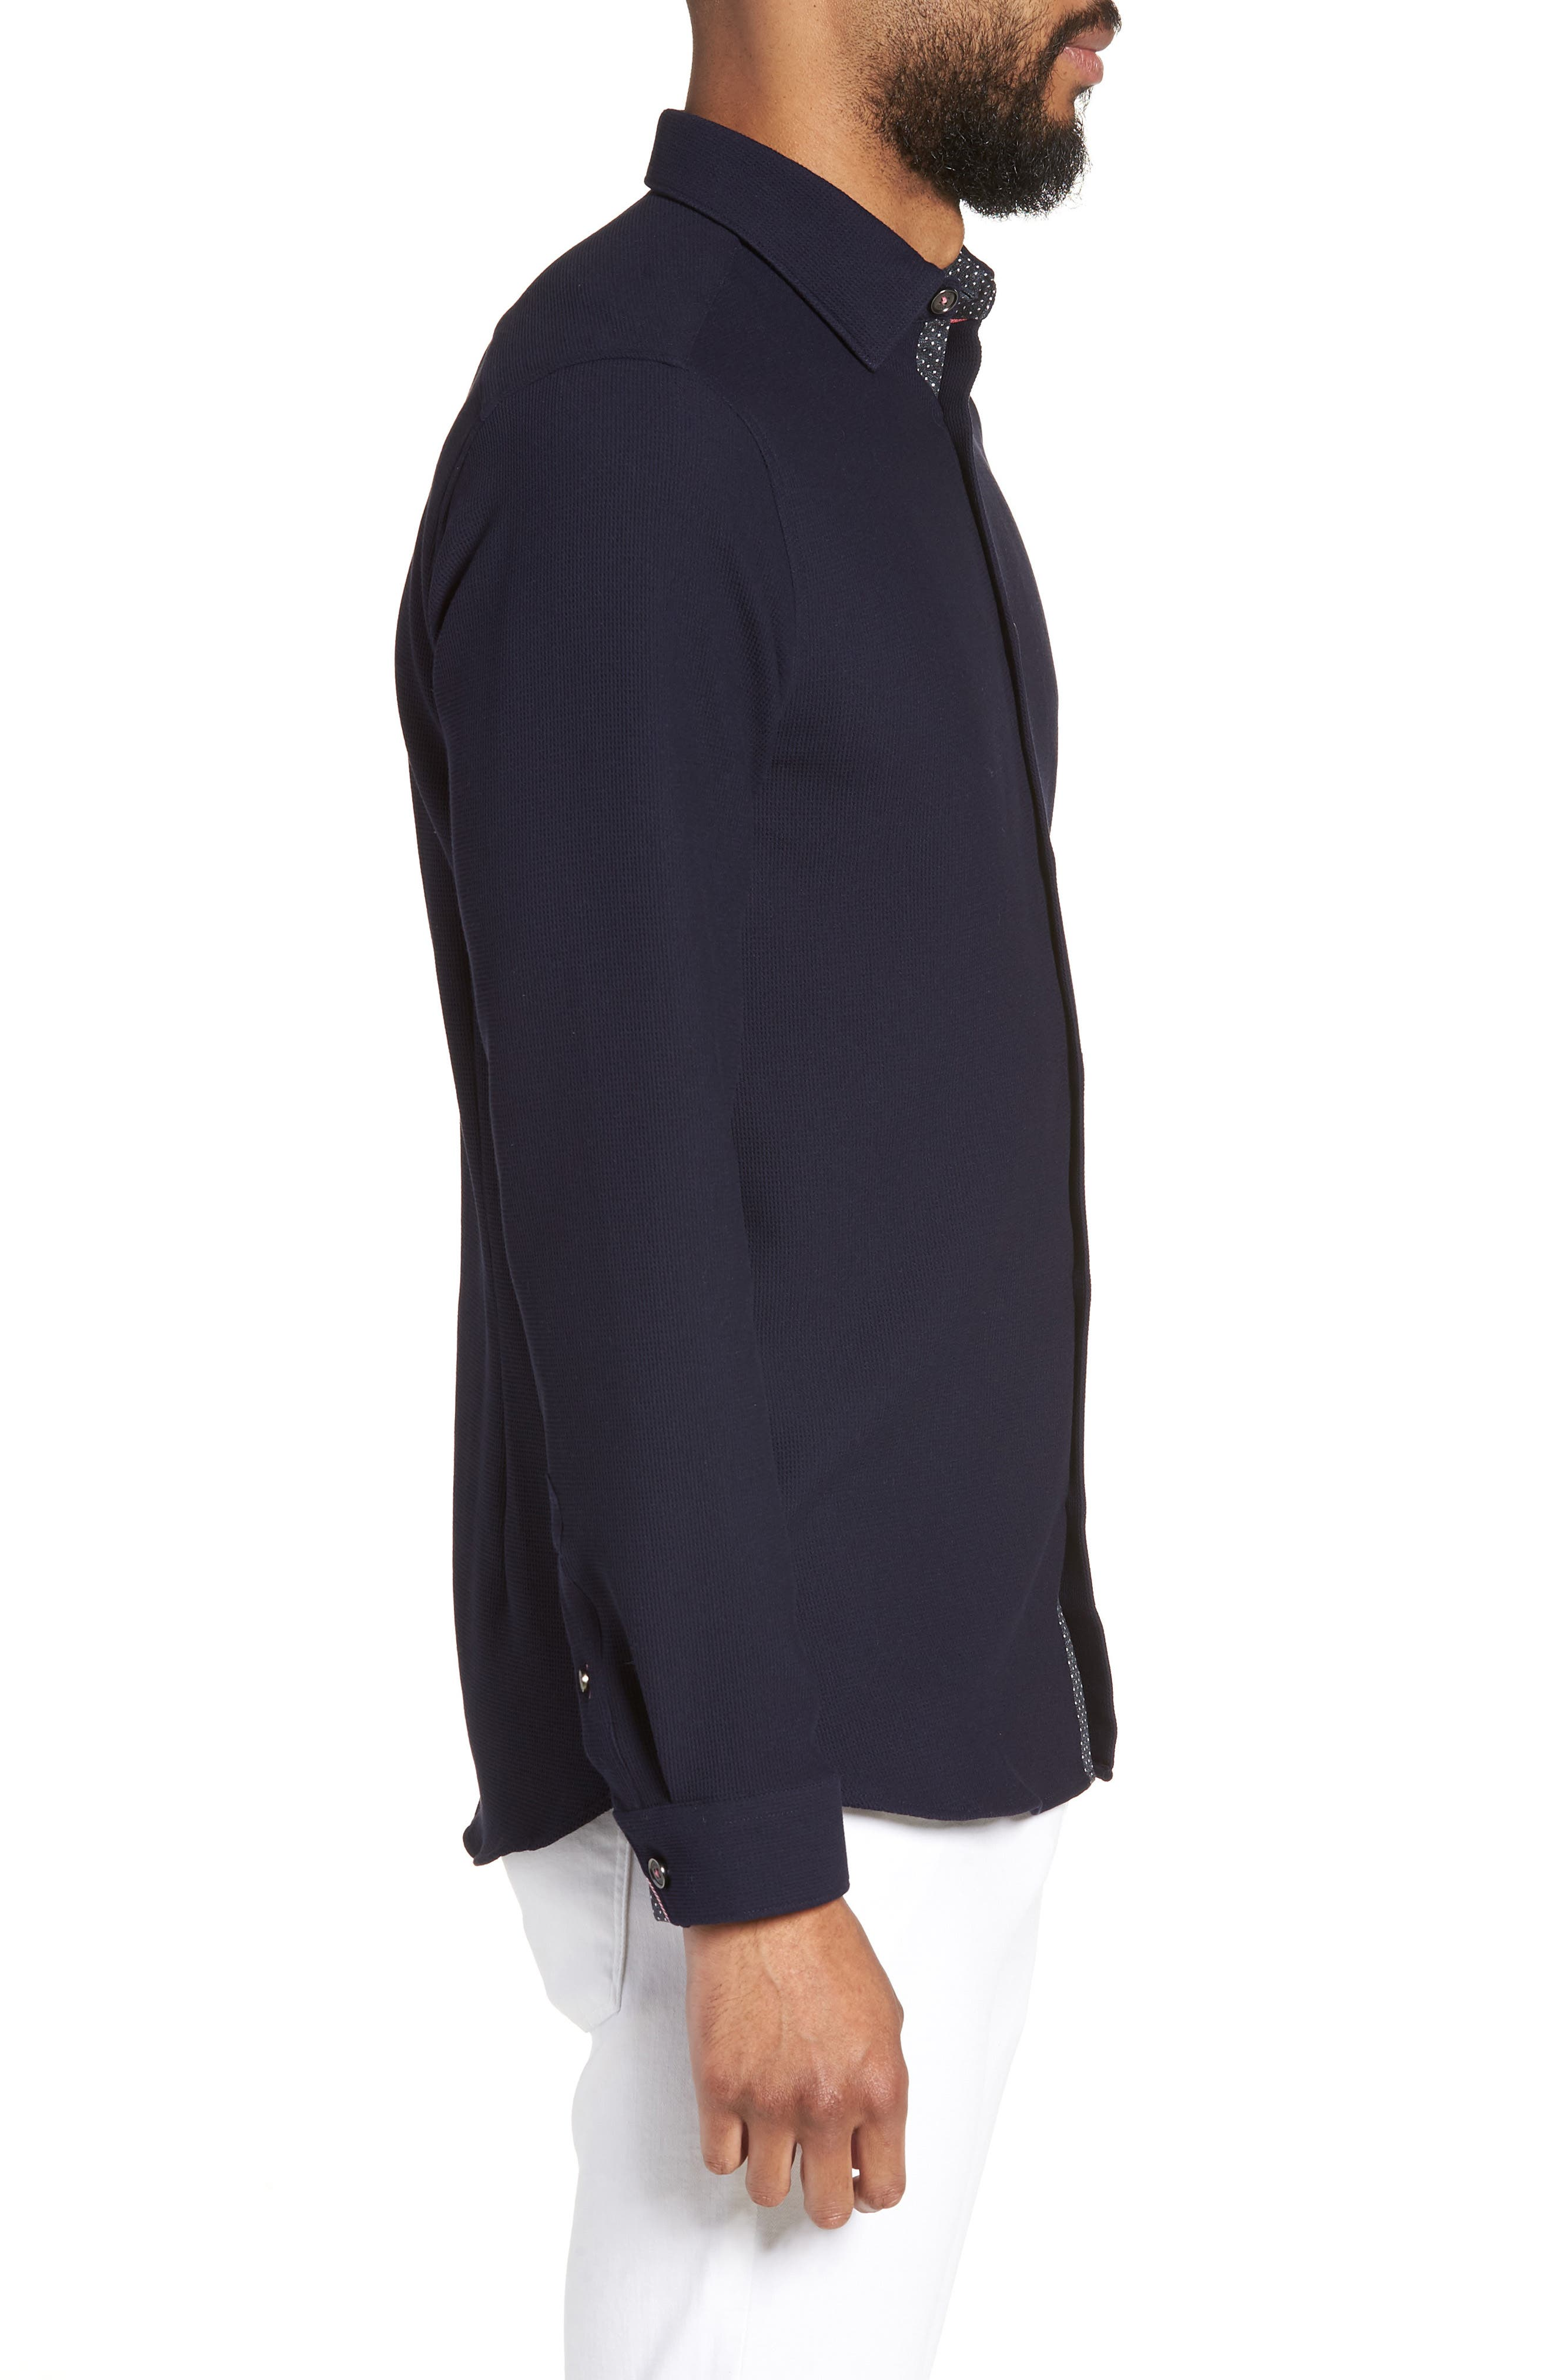 Loretax Trim Fit Stretch Knit Sport Shirt,                             Alternate thumbnail 4, color,                             Navy